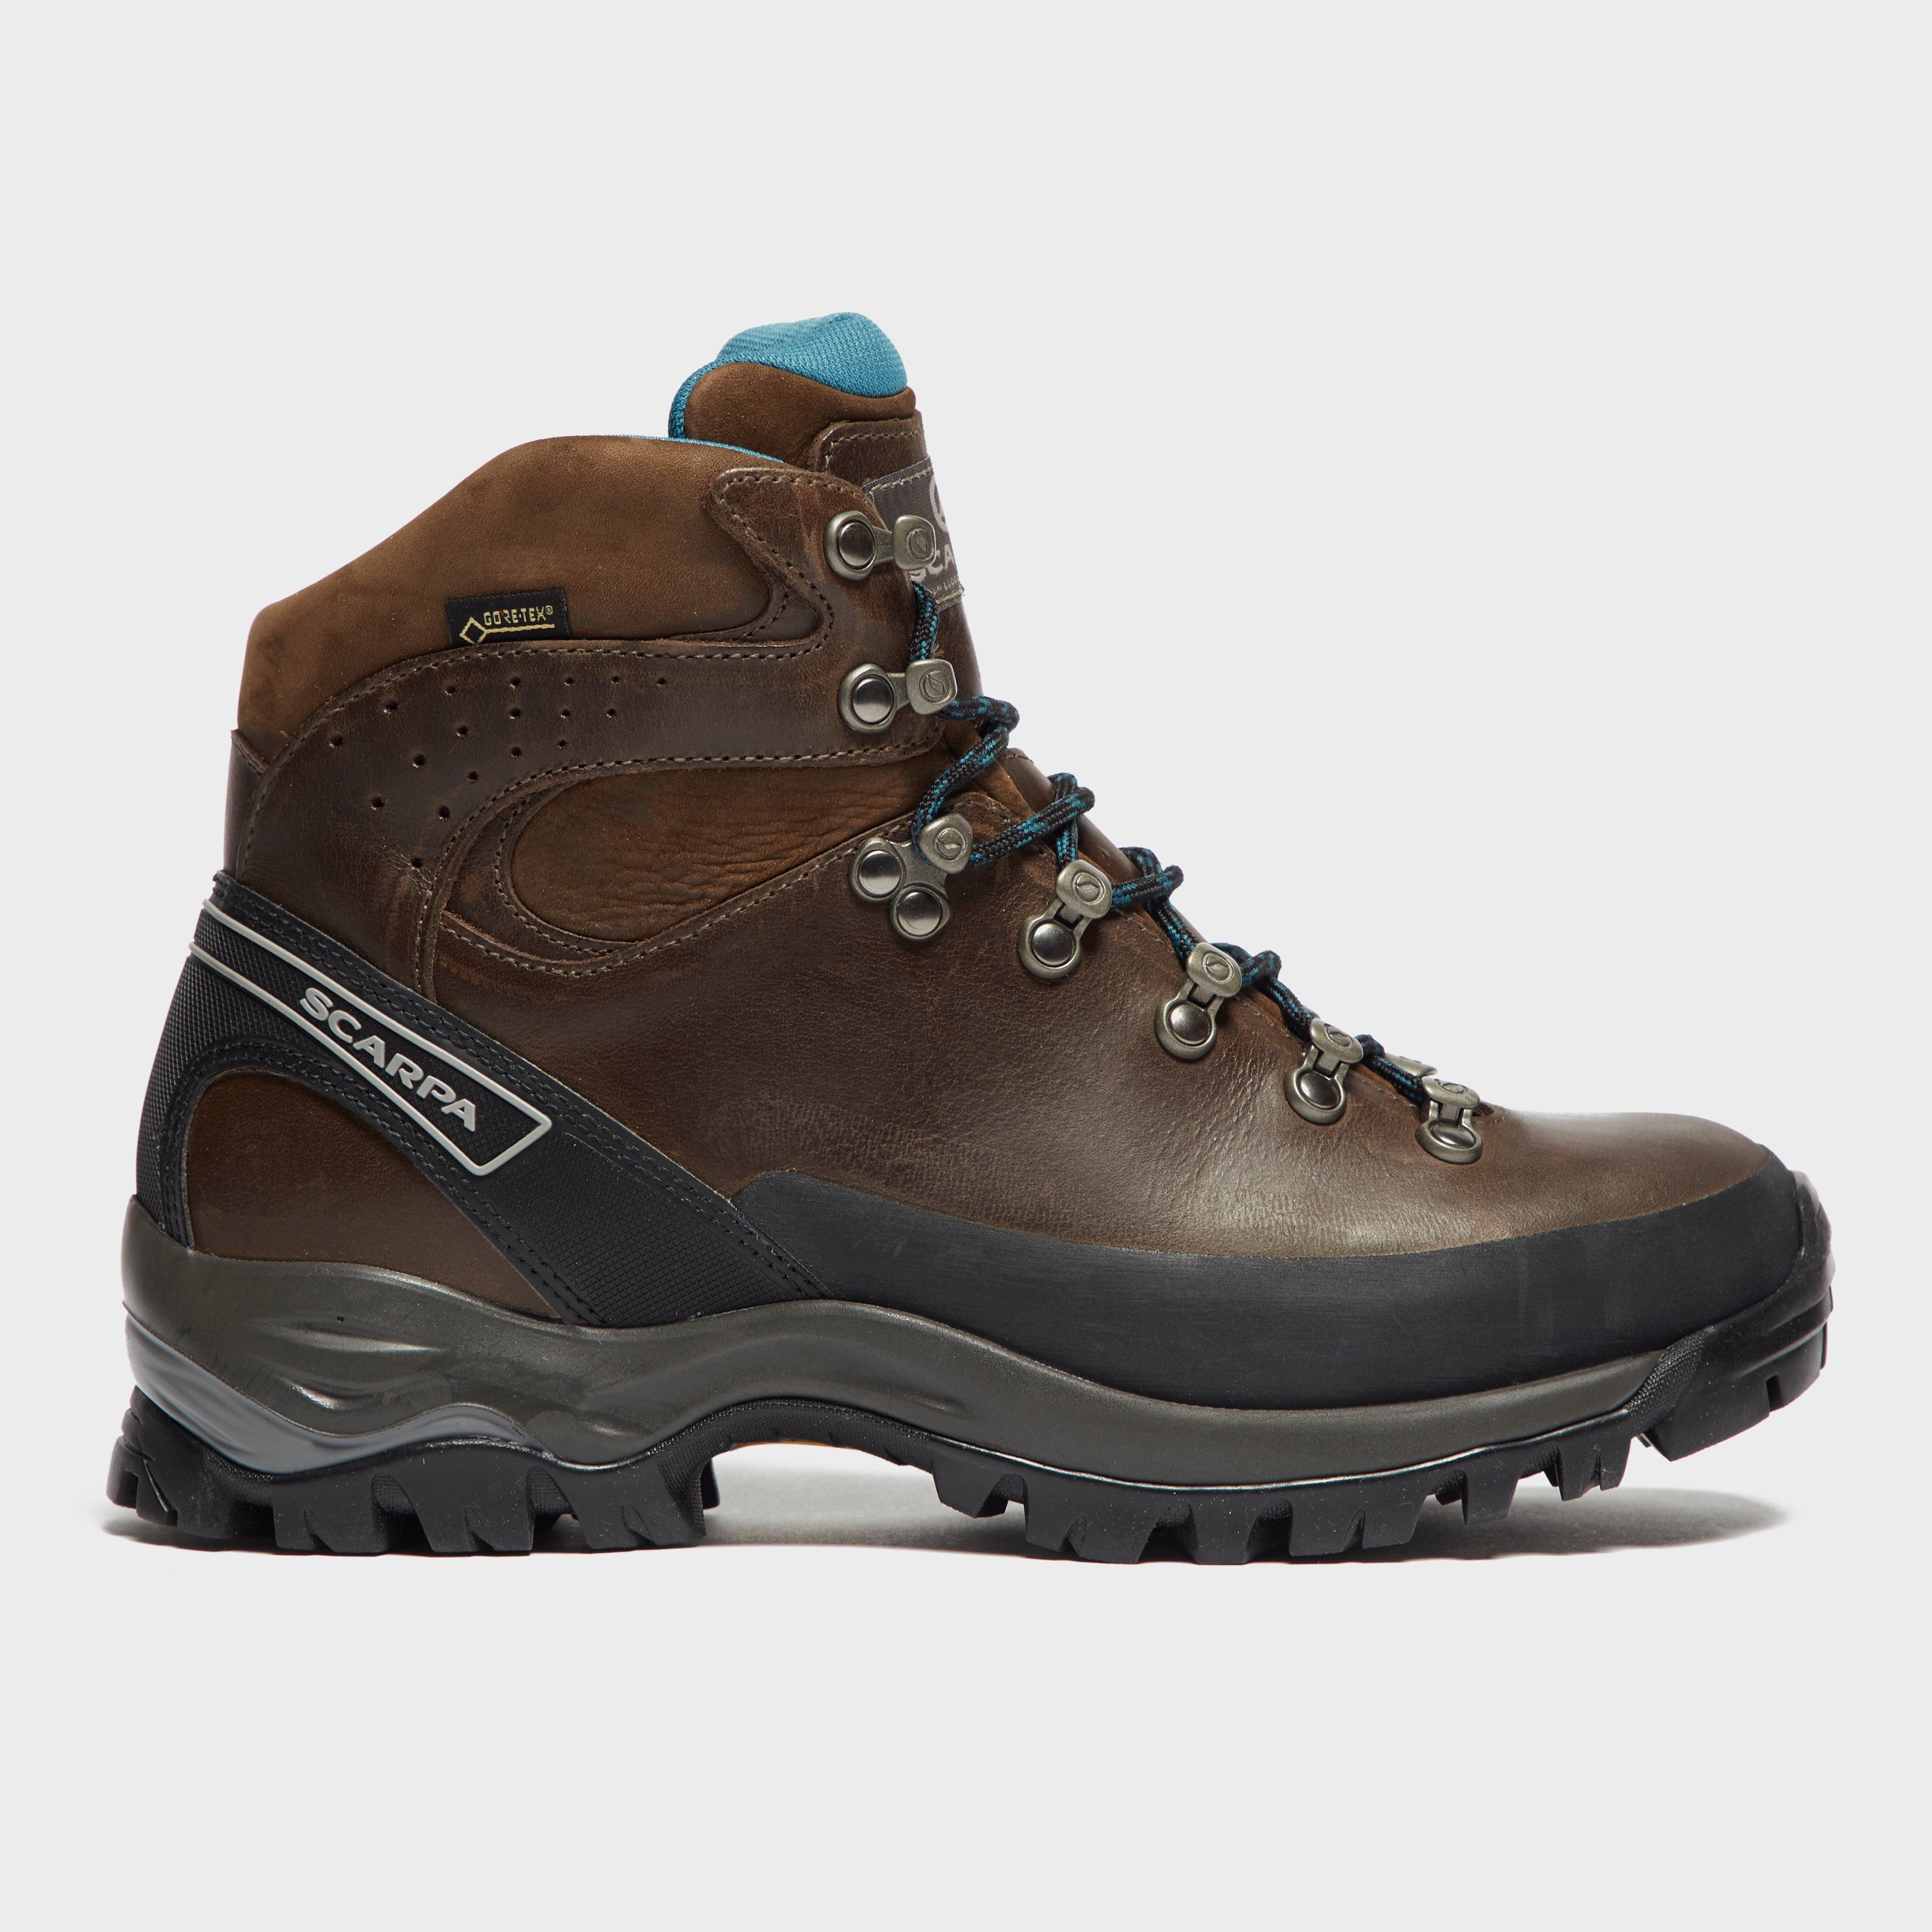 SCARPA Women's Kailash GORE-TEX® Hiking Boot